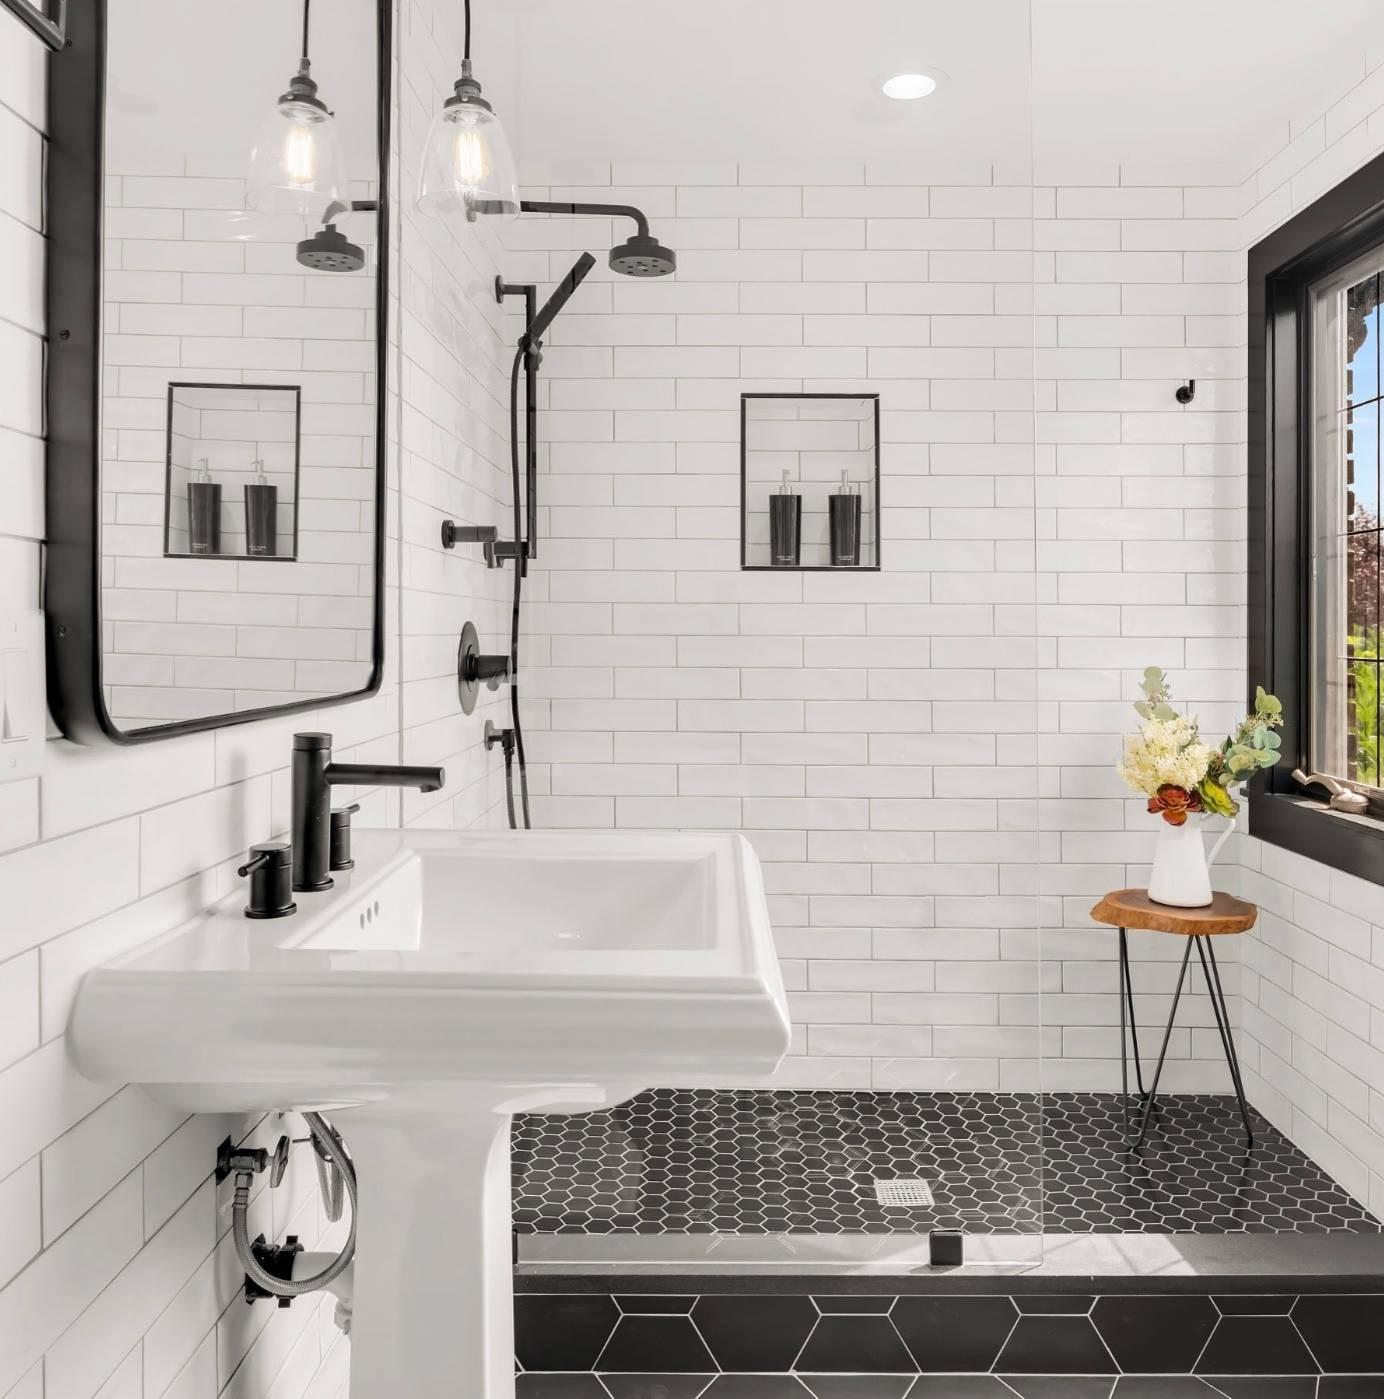 Luxury Bathroom Contrast ideas for you